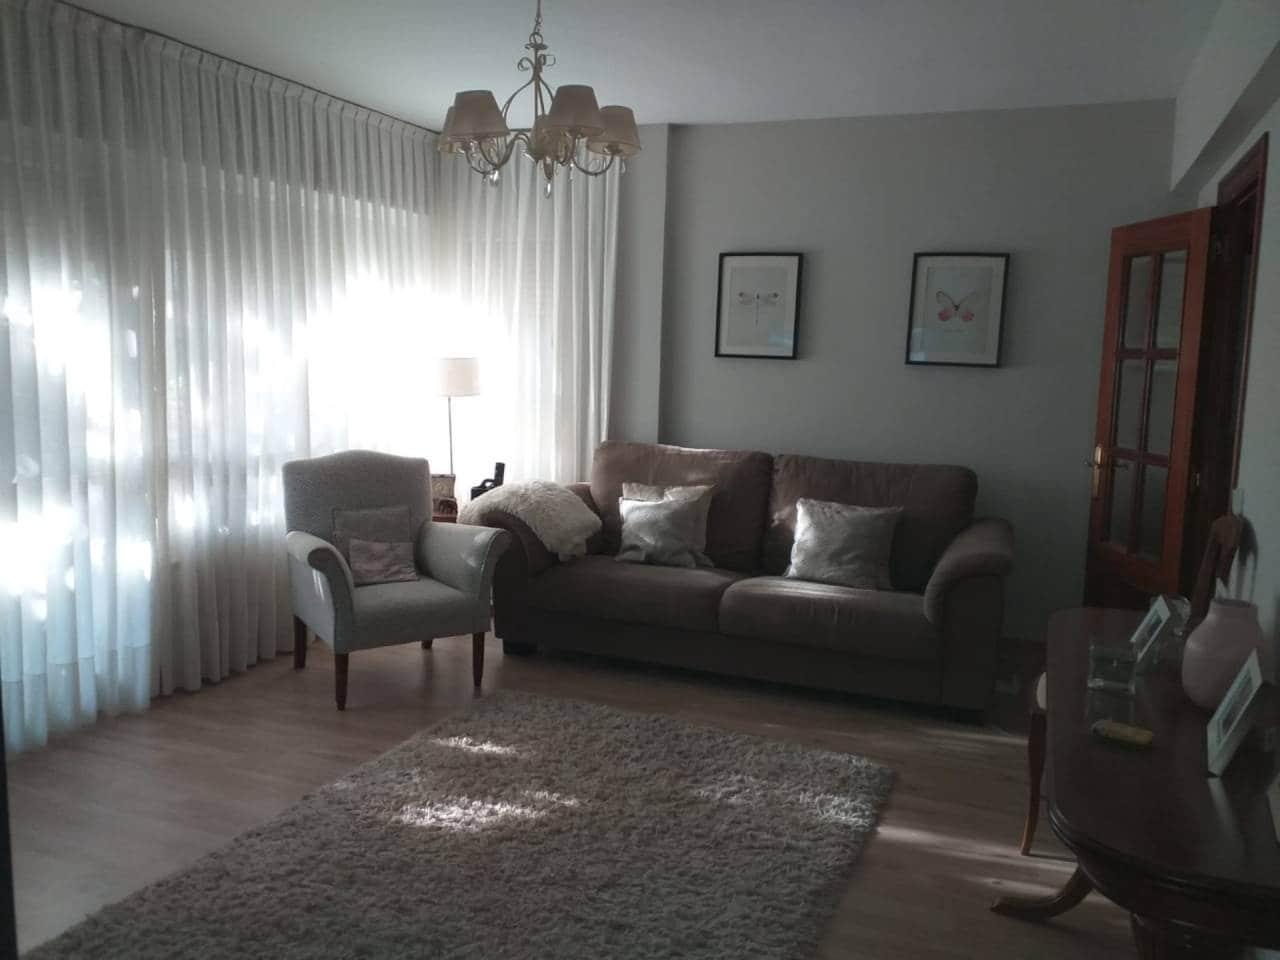 3 chambre Appartement à vendre à Algorta avec garage - 297 000 € (Ref: 5638936)